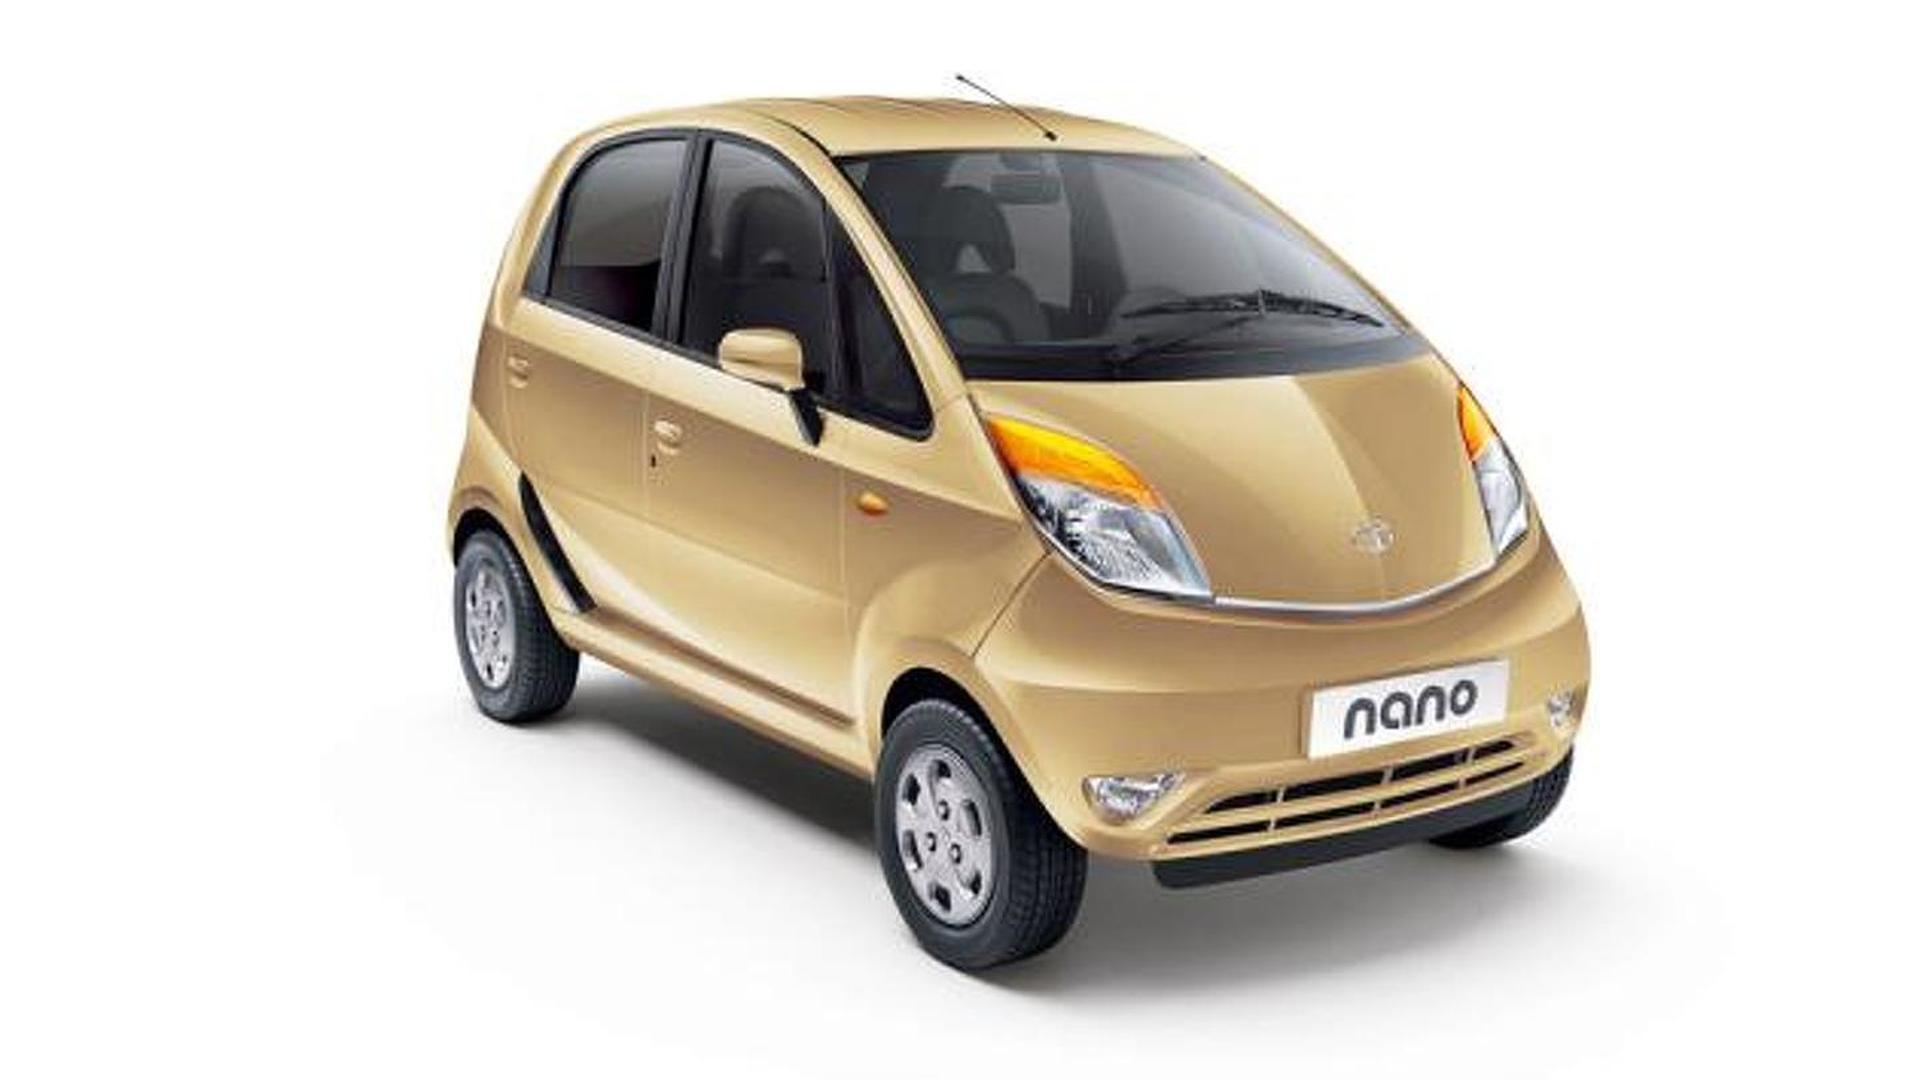 Better equipped second-gen Tata Nano will get bigger engine